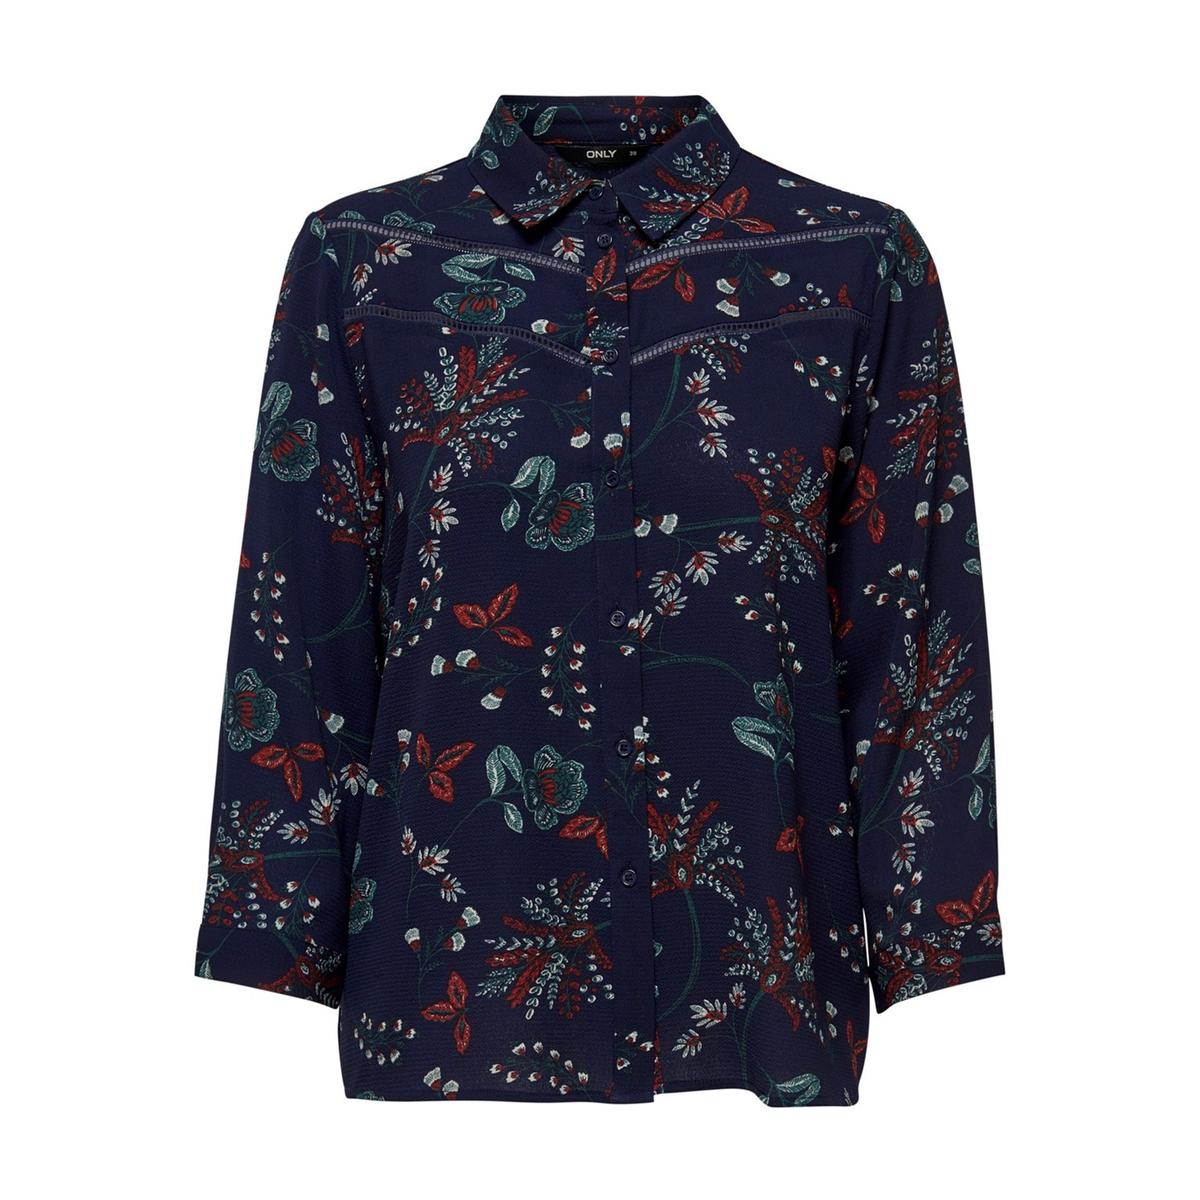 Блузка La Redoute С цветочным рисунком и рукавами 40 (FR) - 46 (RUS) синий бушлат la redoute с рисунком клетка 34 fr 40 rus синий